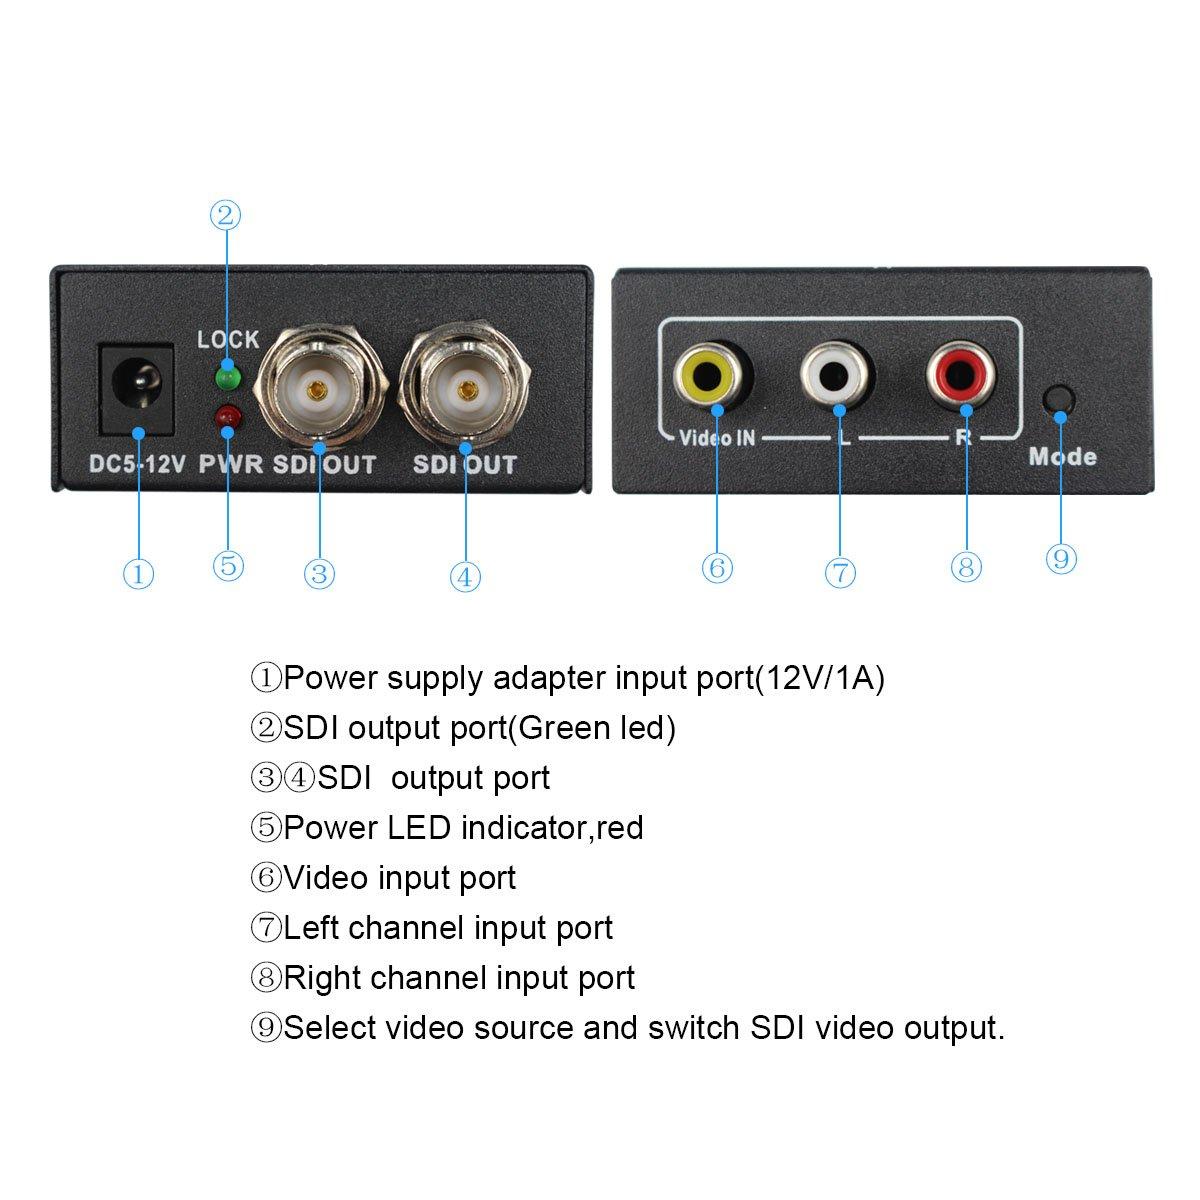 Wiistar AV CVBS to 3G-SDI Audio Video Converter Composite to SDI Converter Support 1080P for CRT HDTV to Camera by Wiistar (Image #4)